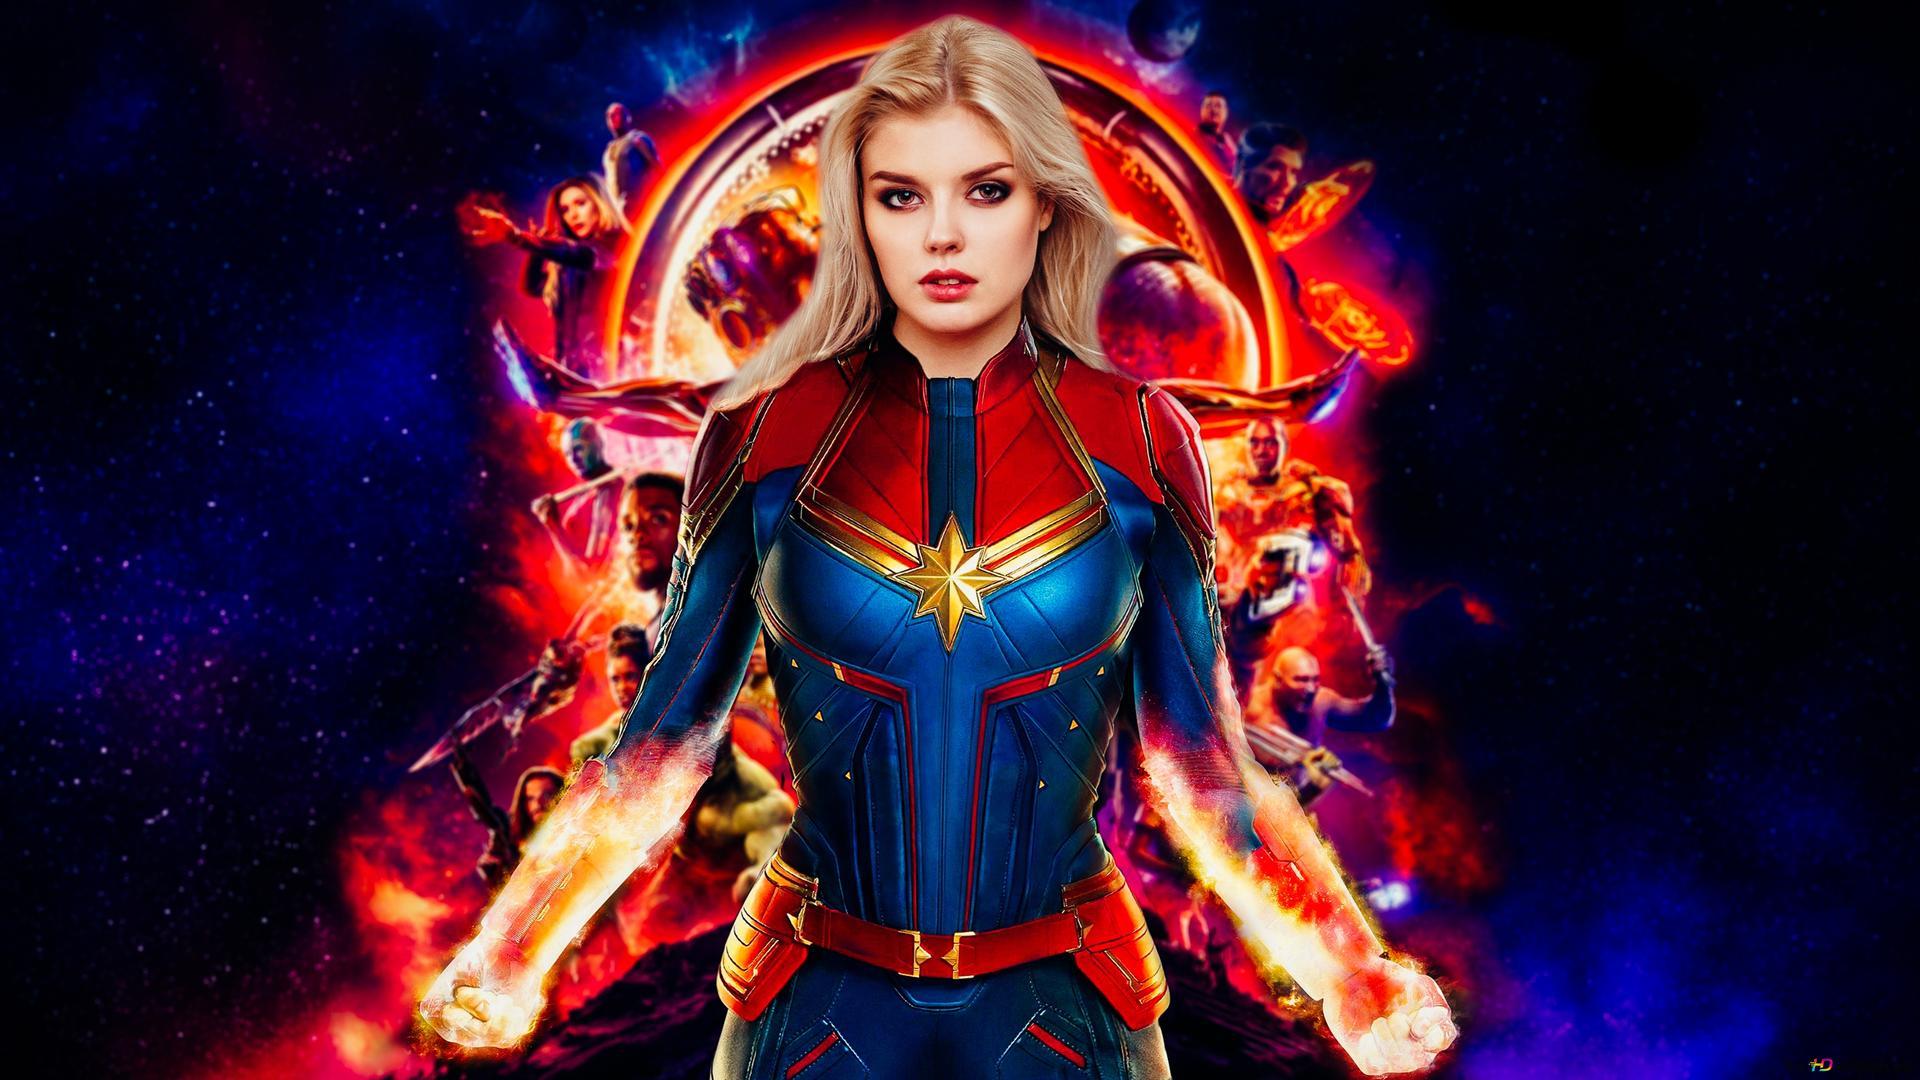 Captain Marvel Hd Wallpaper Download